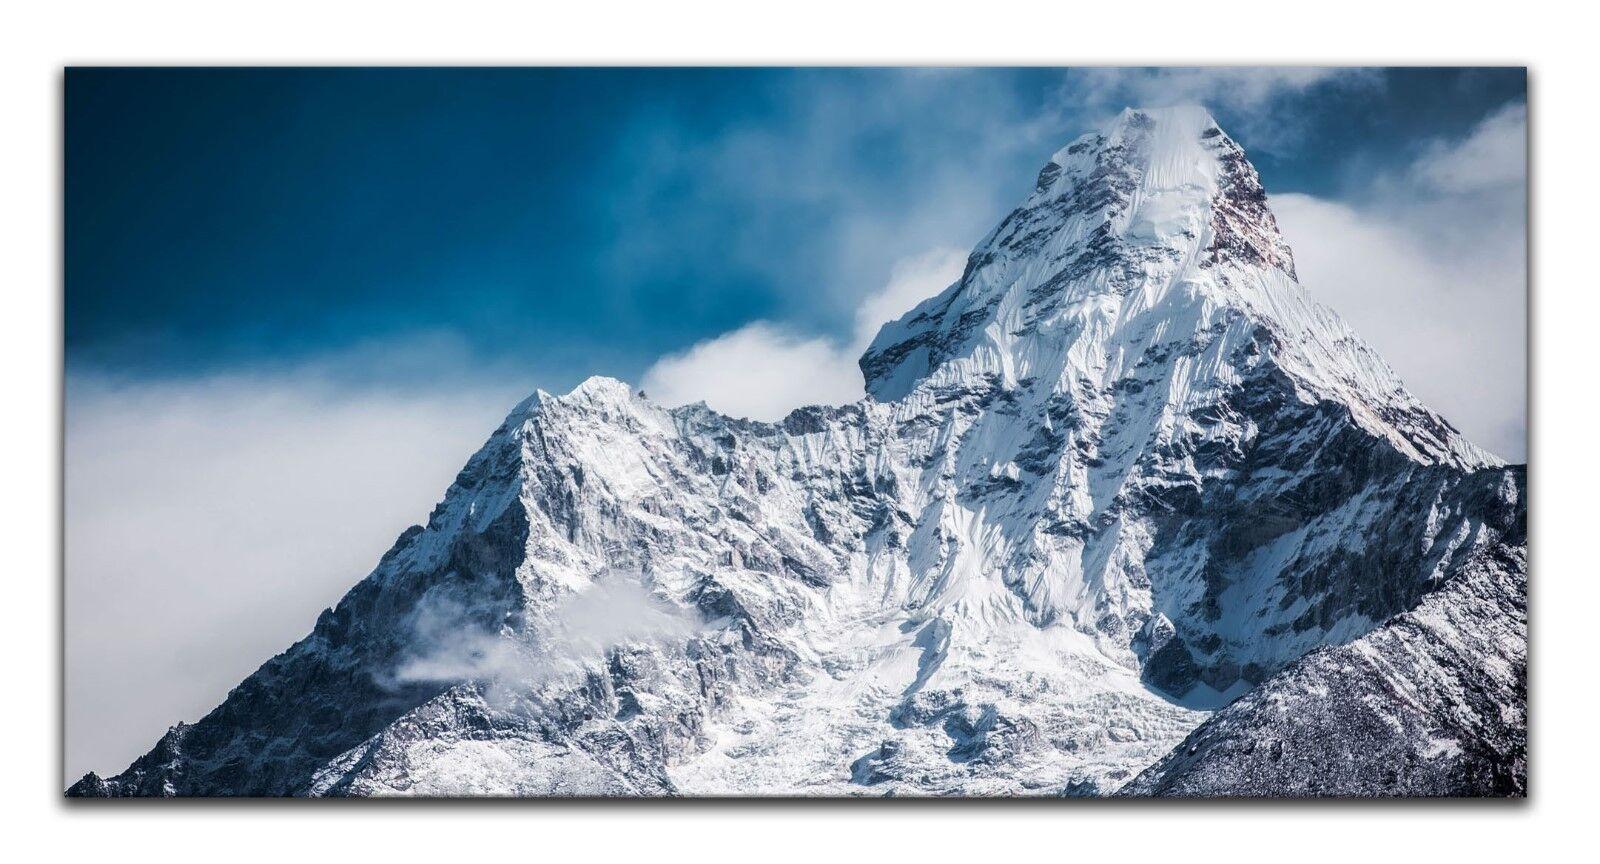 Leinwand Panorama Bild Wandbild Keilrahmenbild Berge Nepal Everest